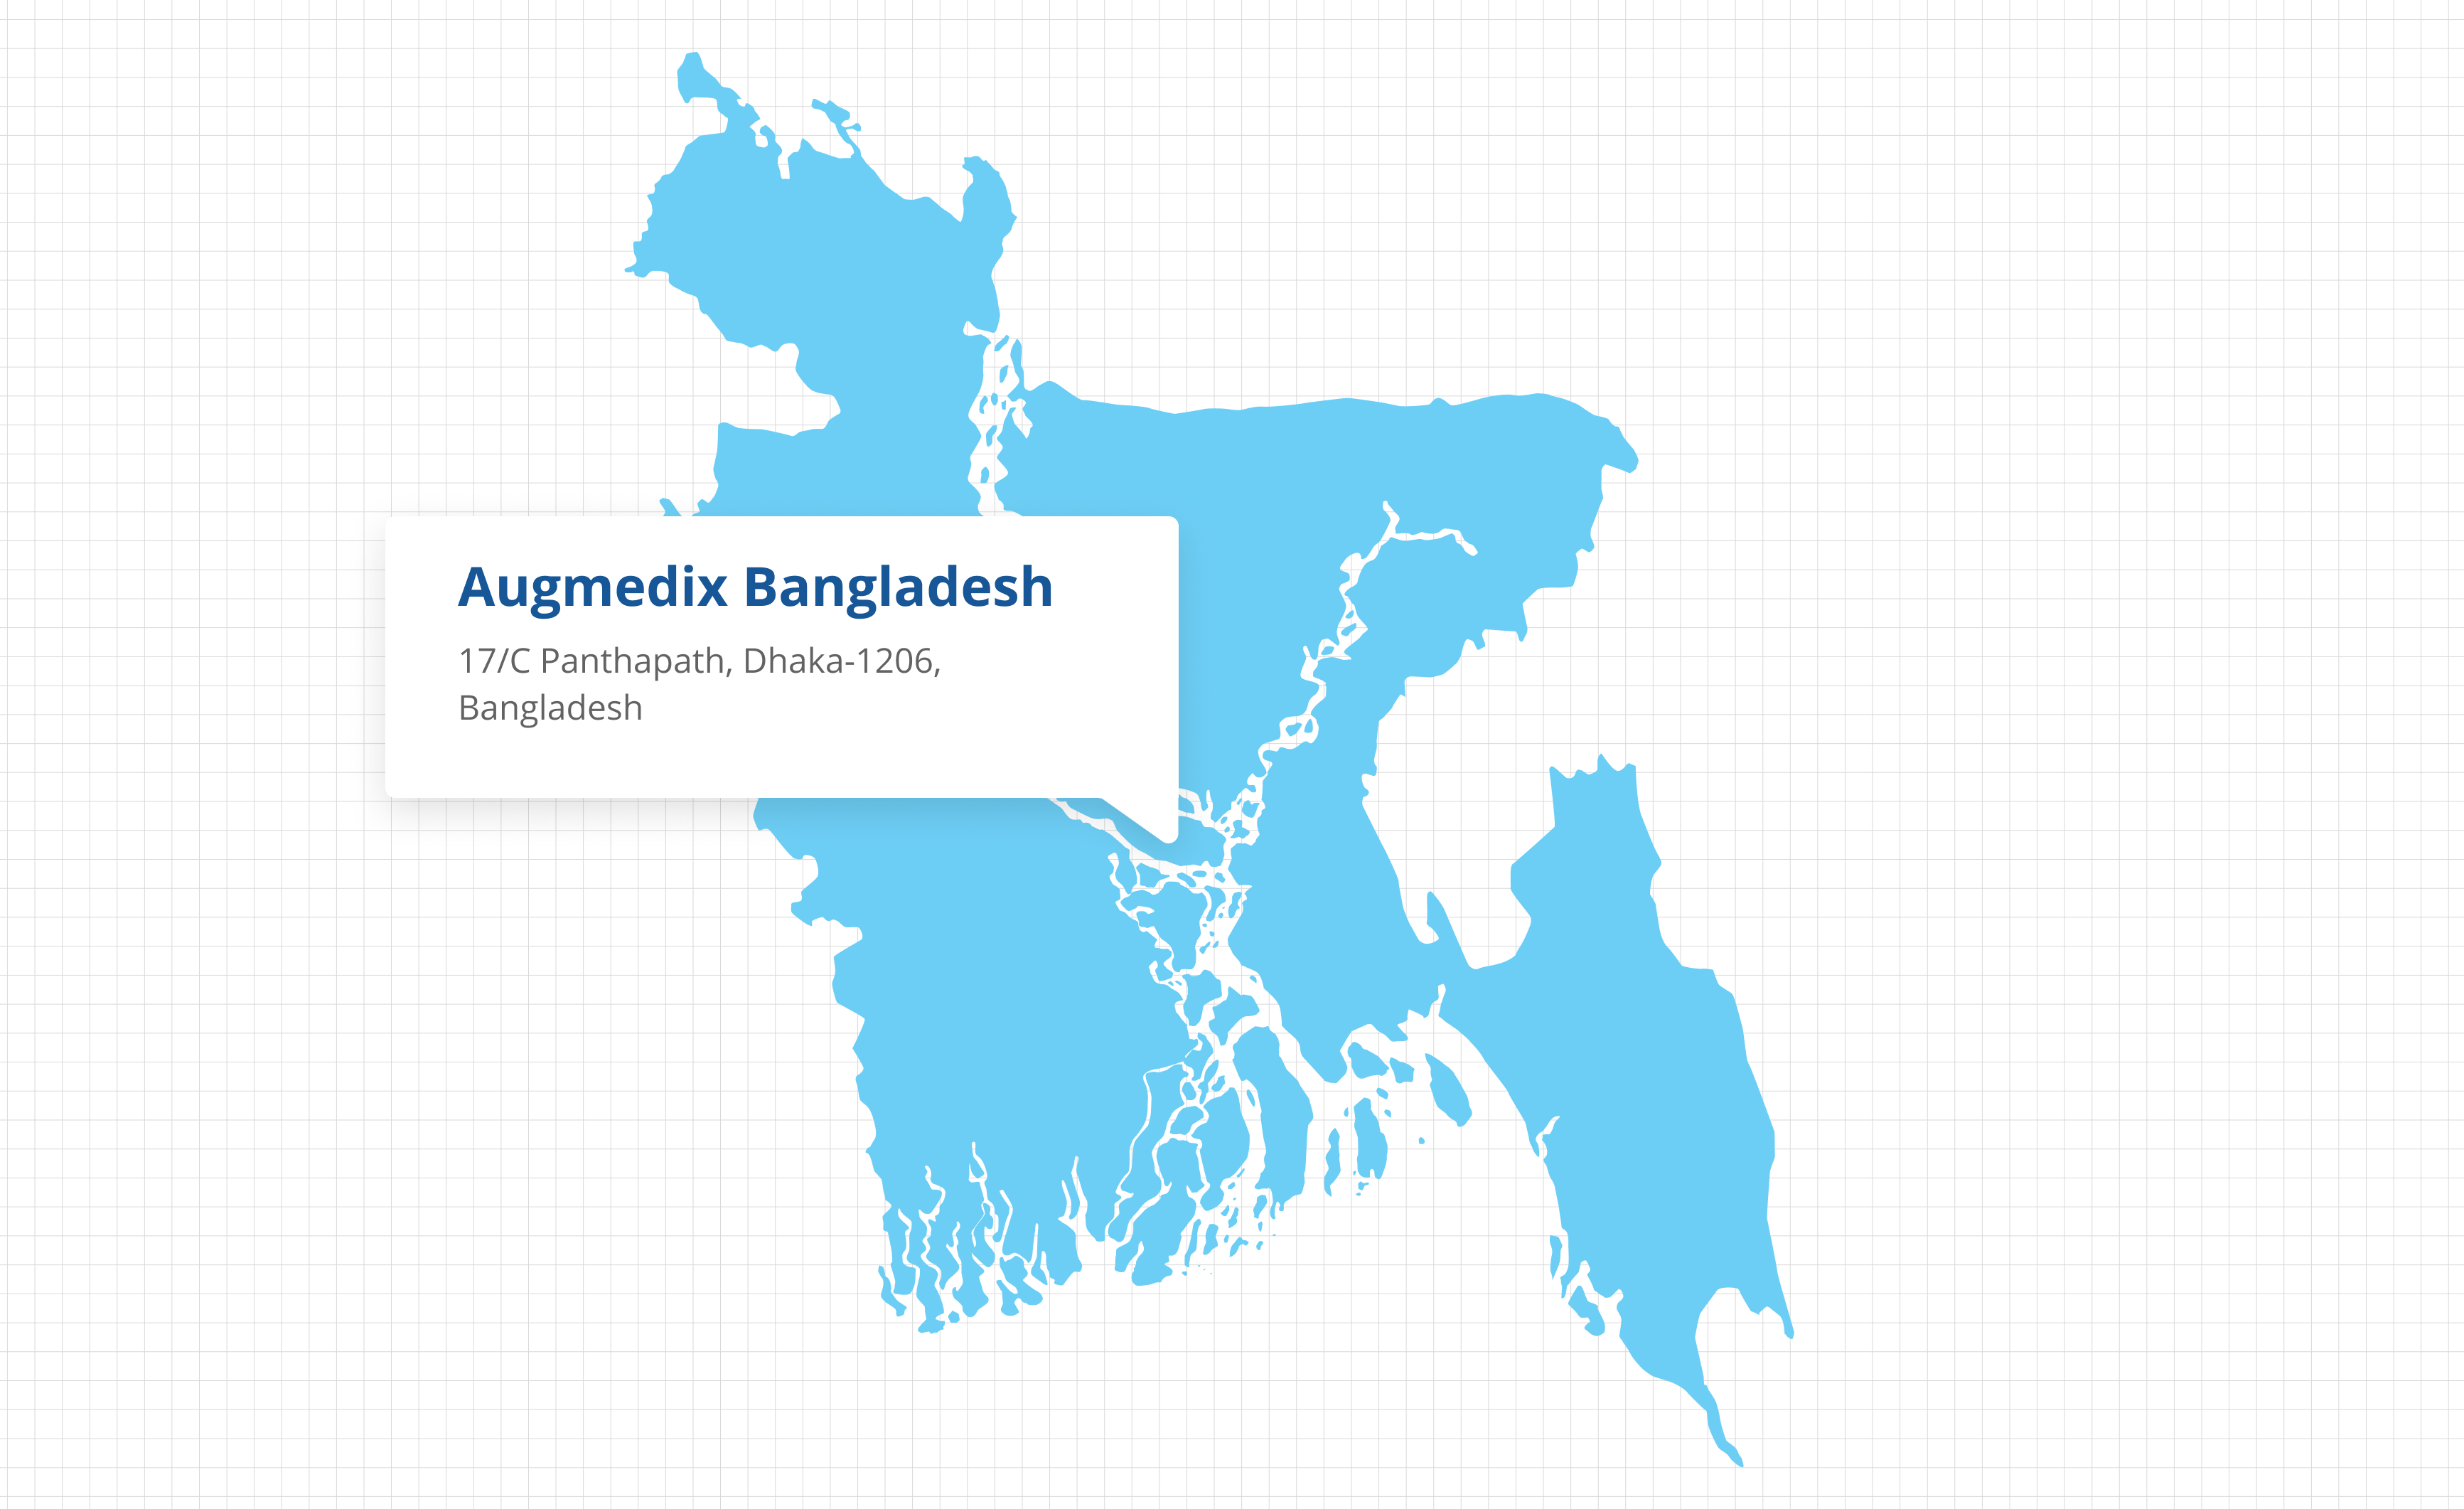 Augmedix Bangladesh